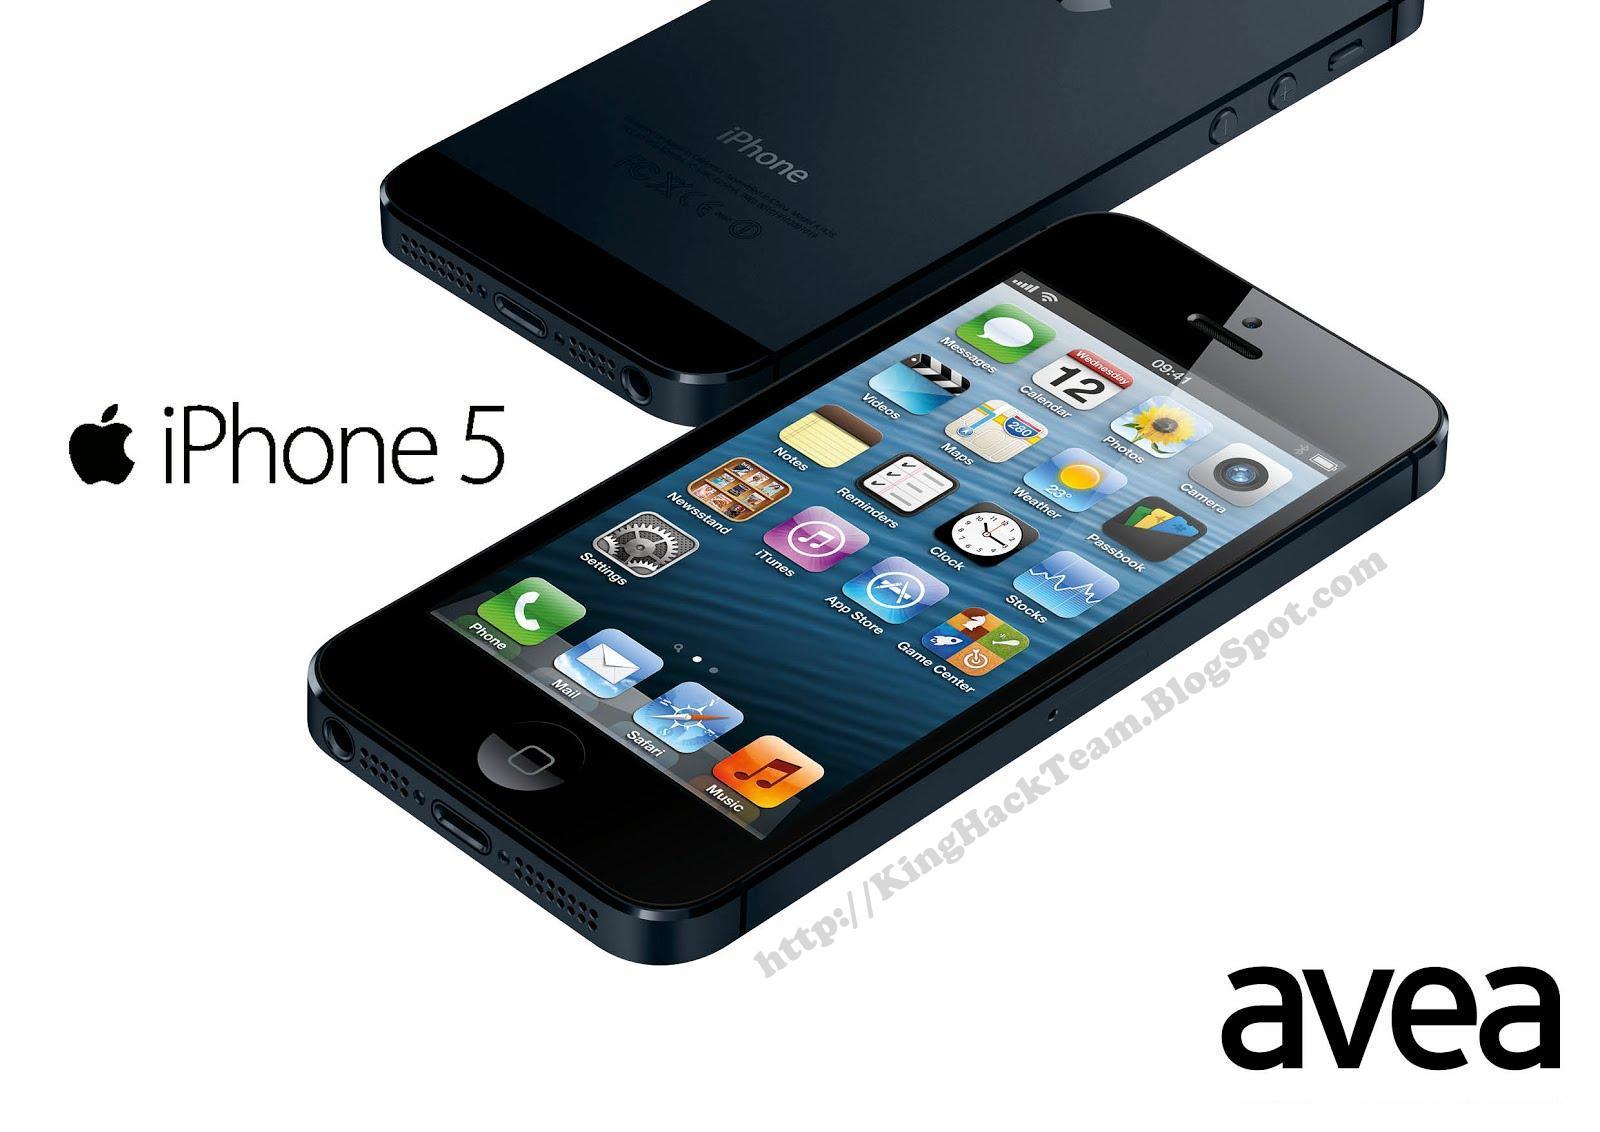 video-iphone5-avea-reklam-filmi-izle-kampanya-24-tl-taksit-detay ...